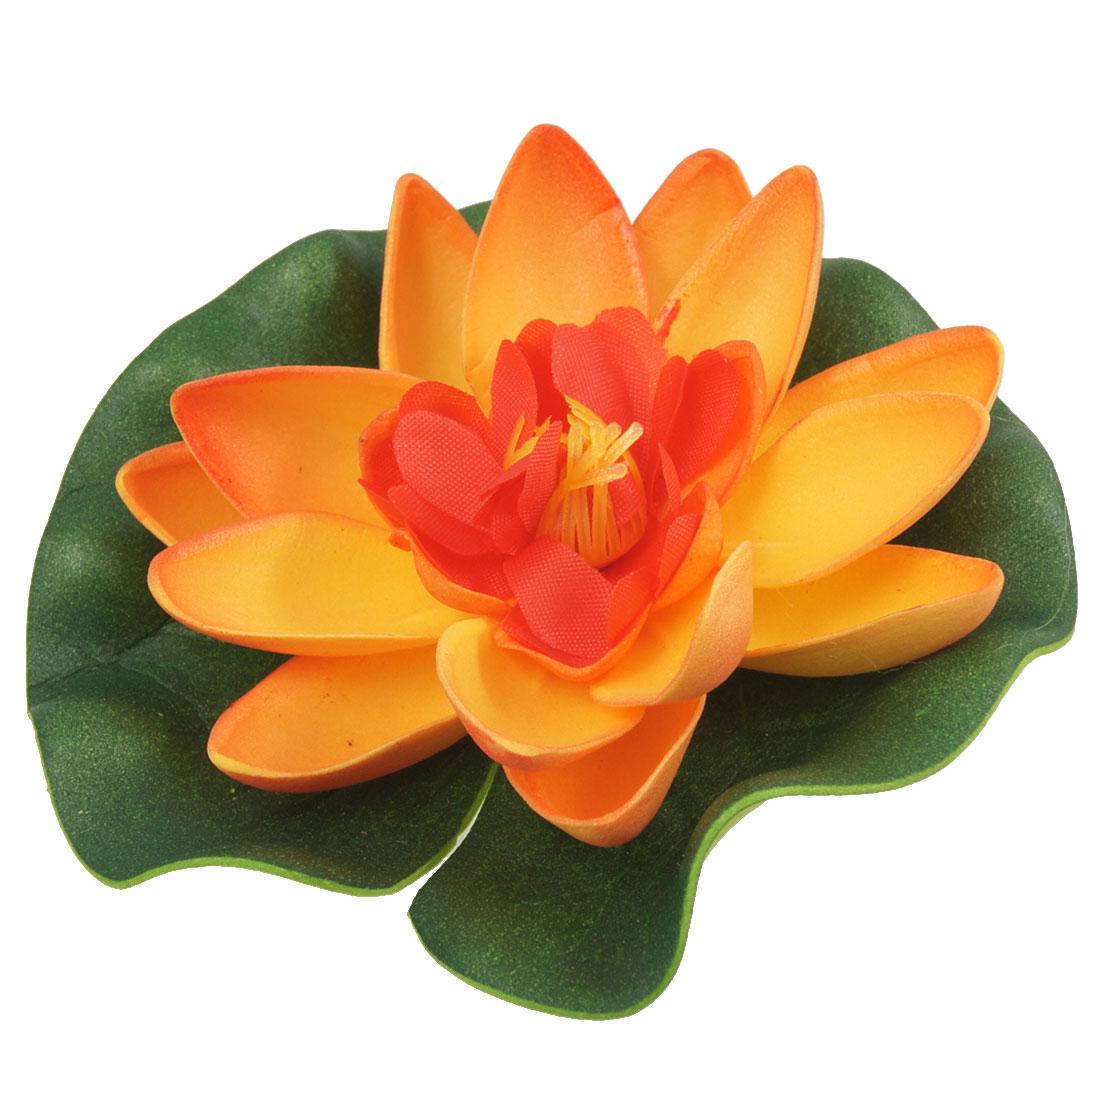 Small Size Foam Lotus Ornament Orange Green for Aquarium